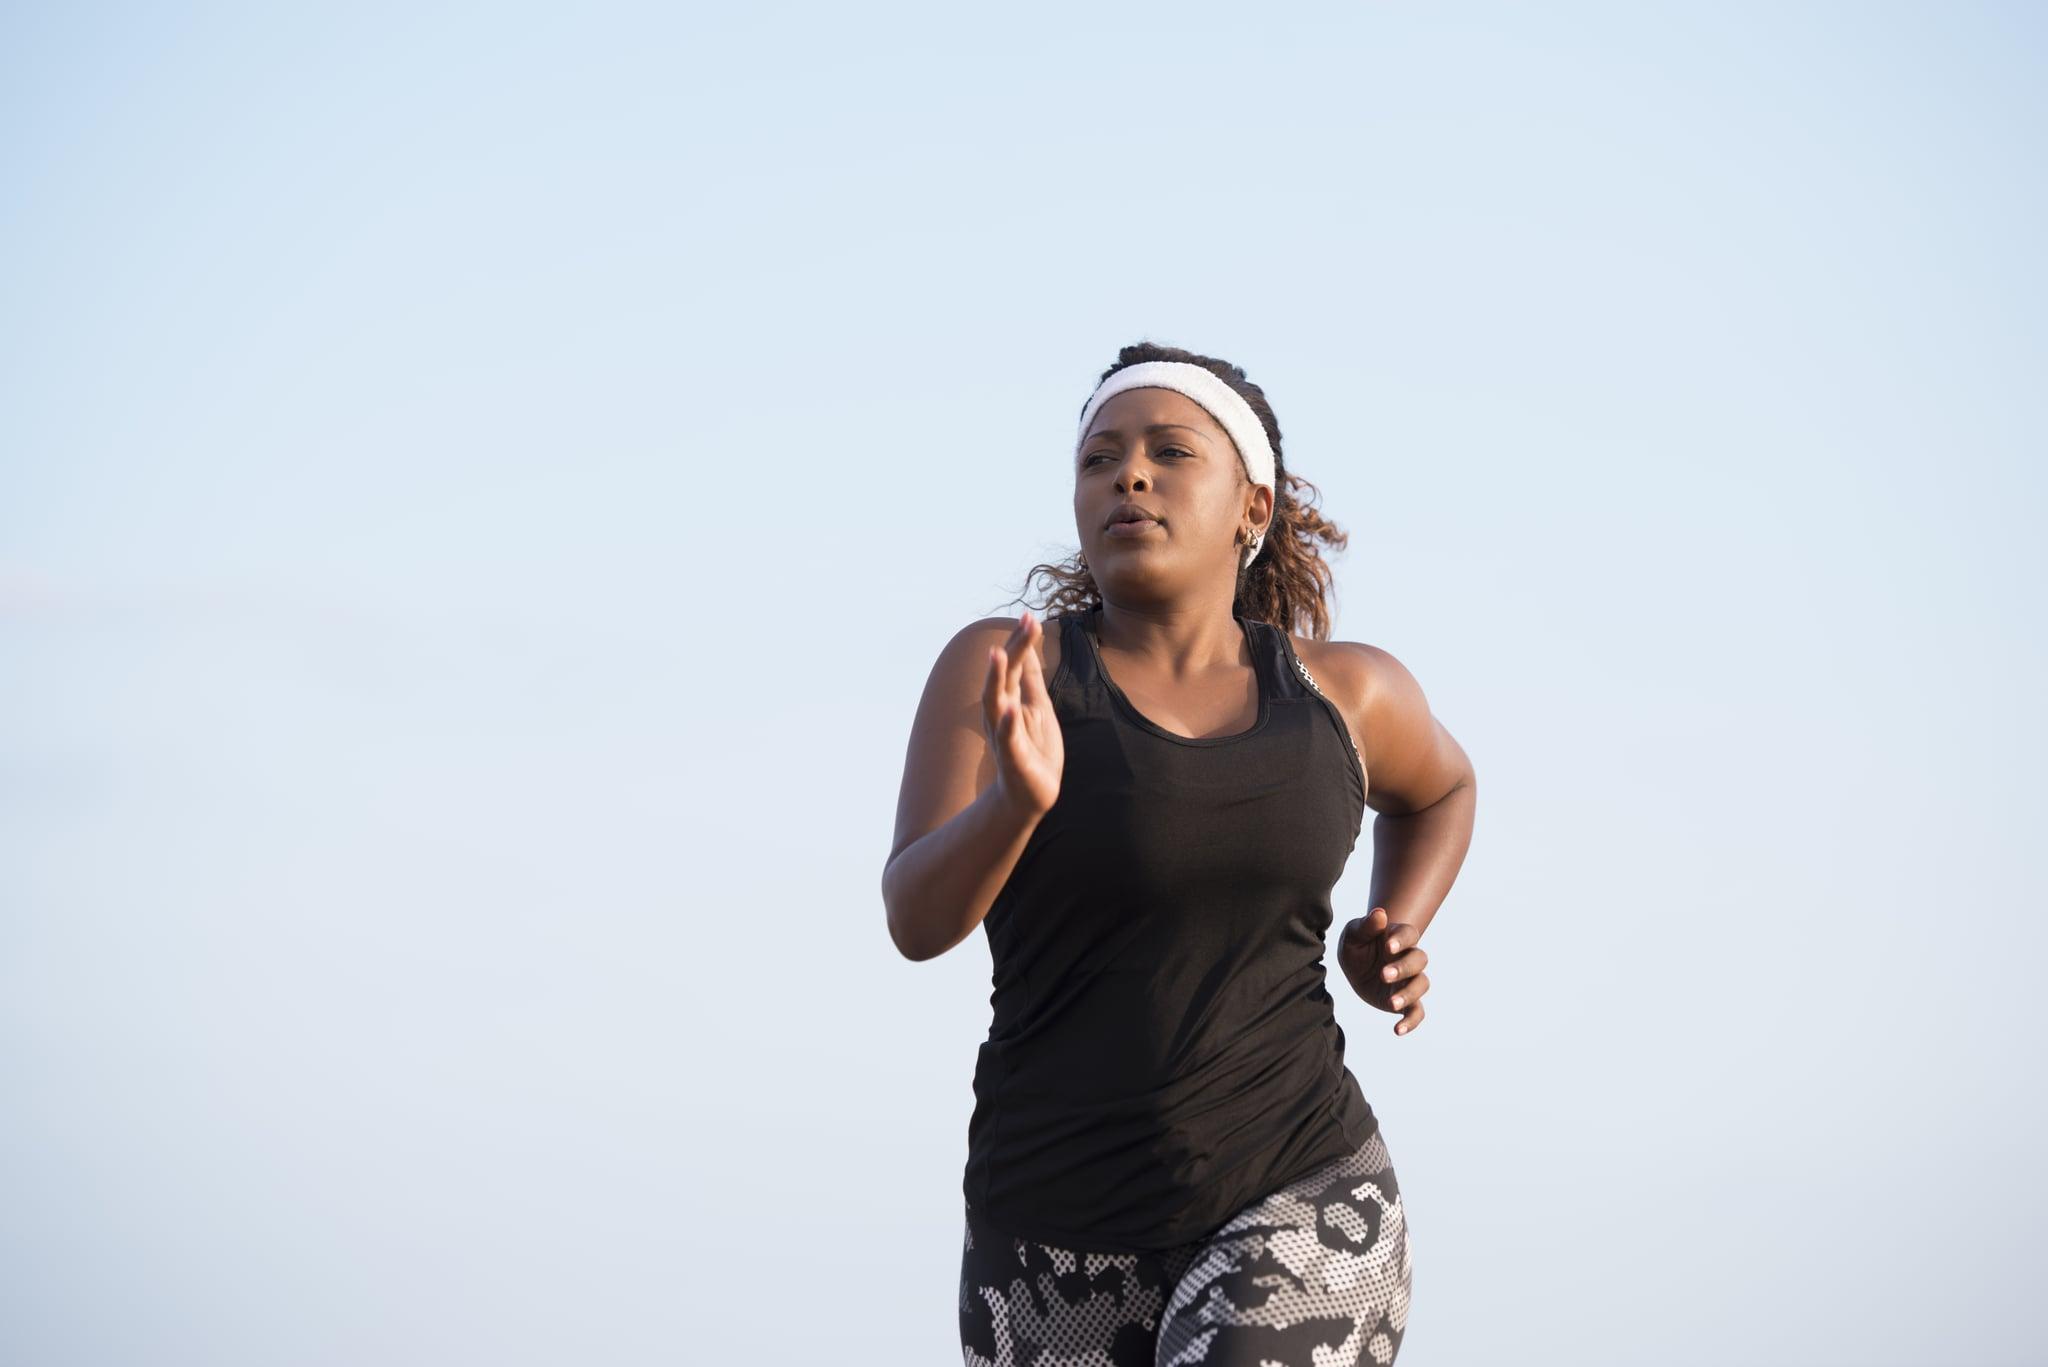 Is Walking Better Than Running For Fat Loss? | POPSUGAR Fitness UK